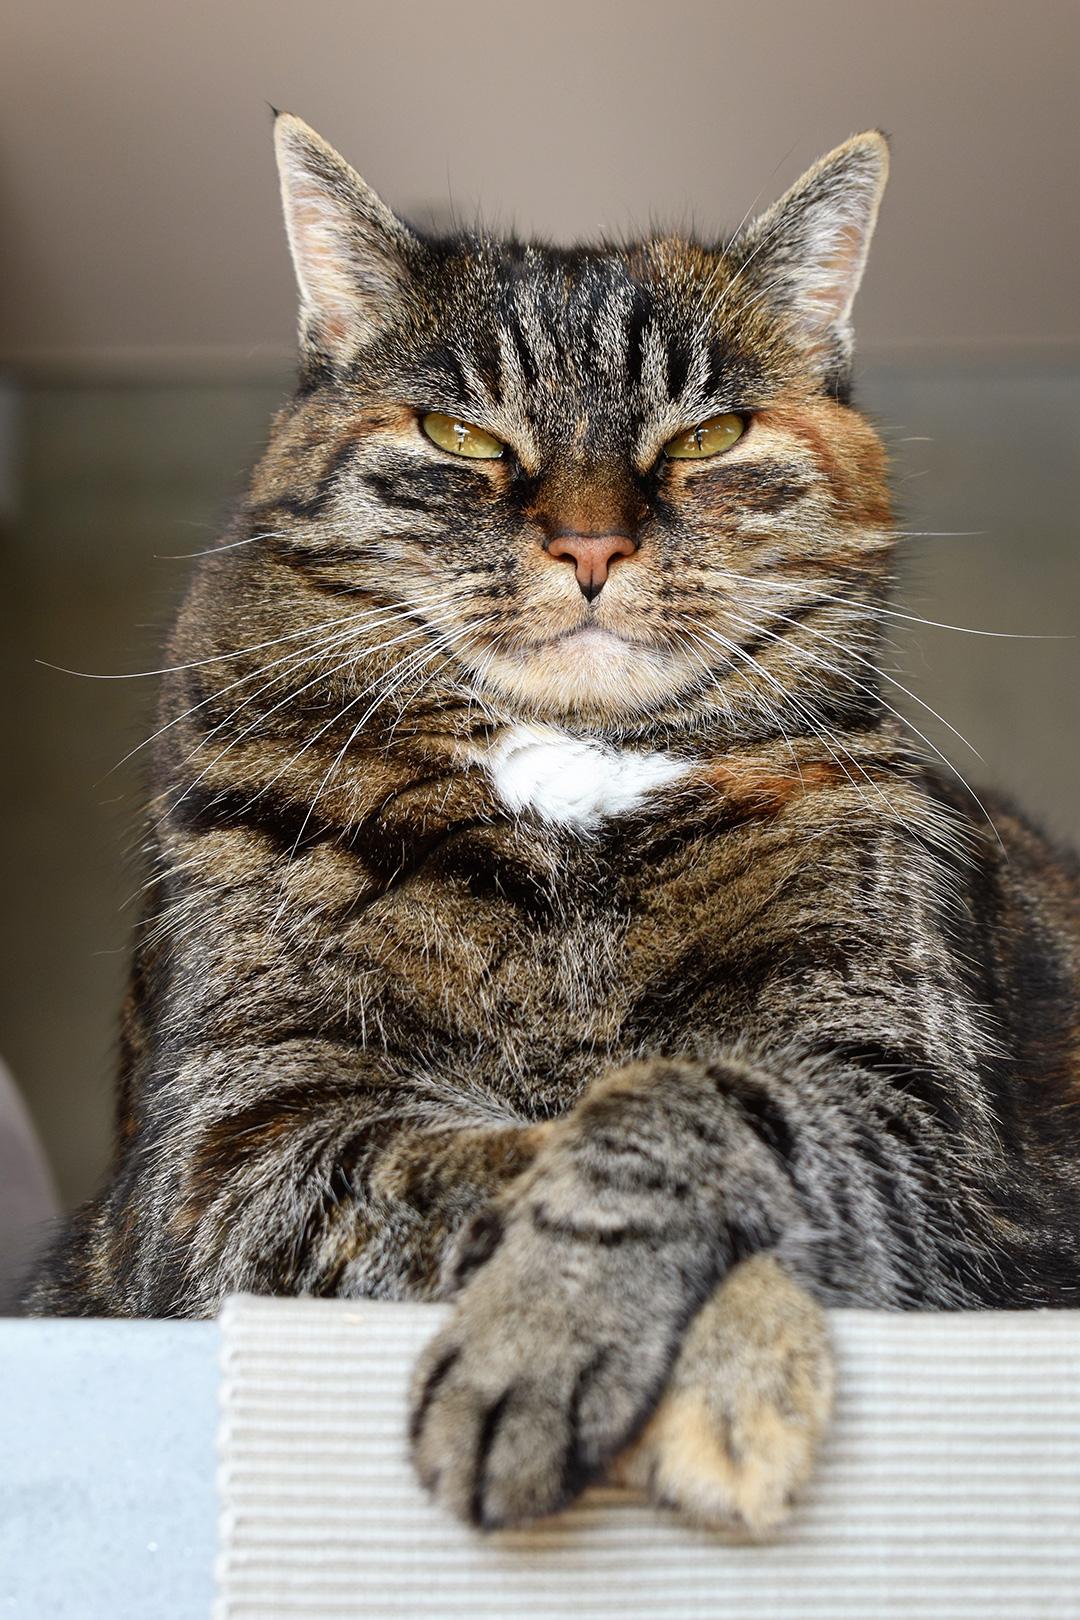 Gato subido a un mueble